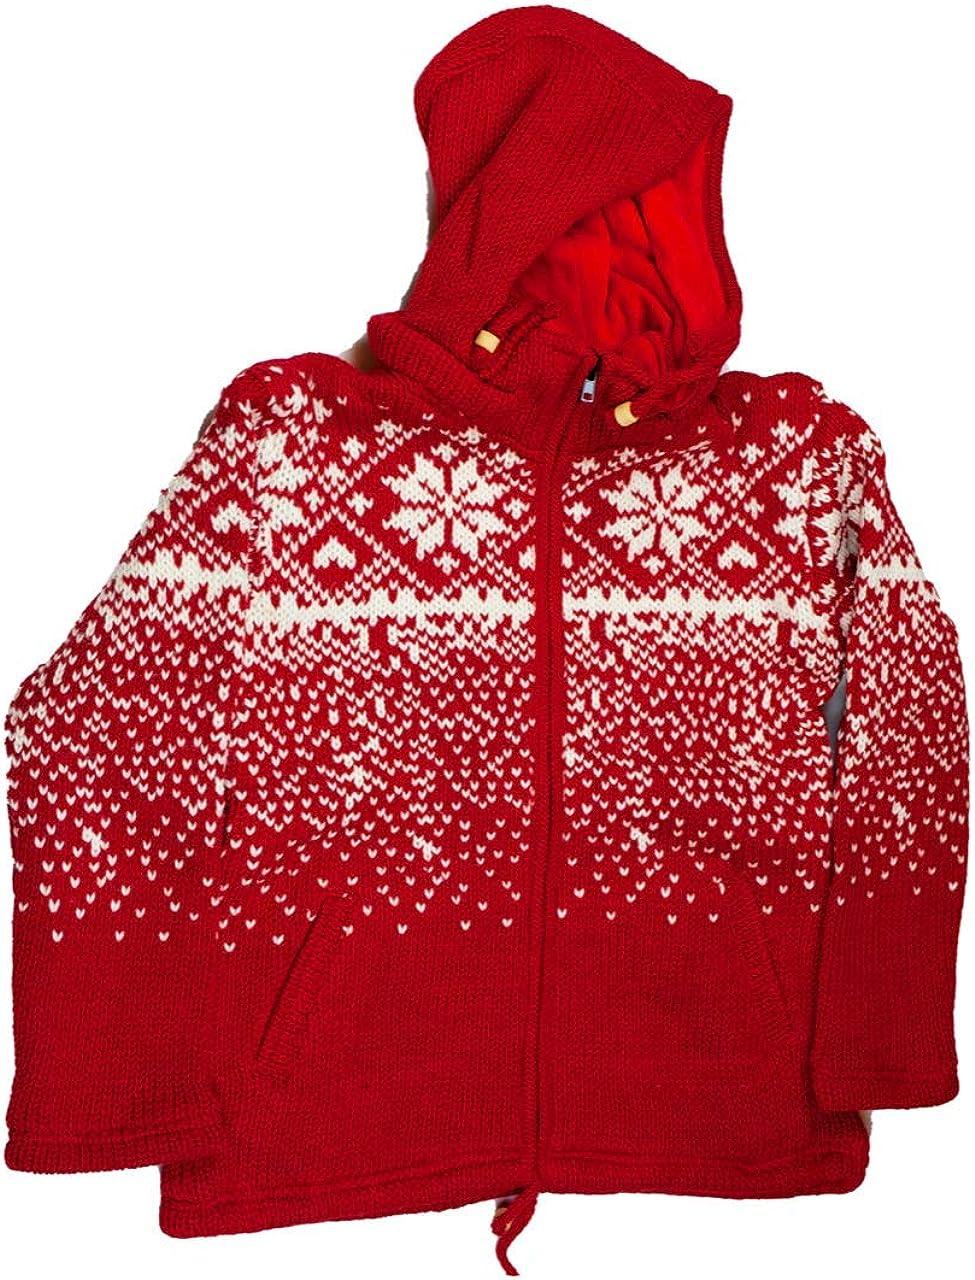 Himalayan Woolen Jacket with Soft Inner Fleece Red